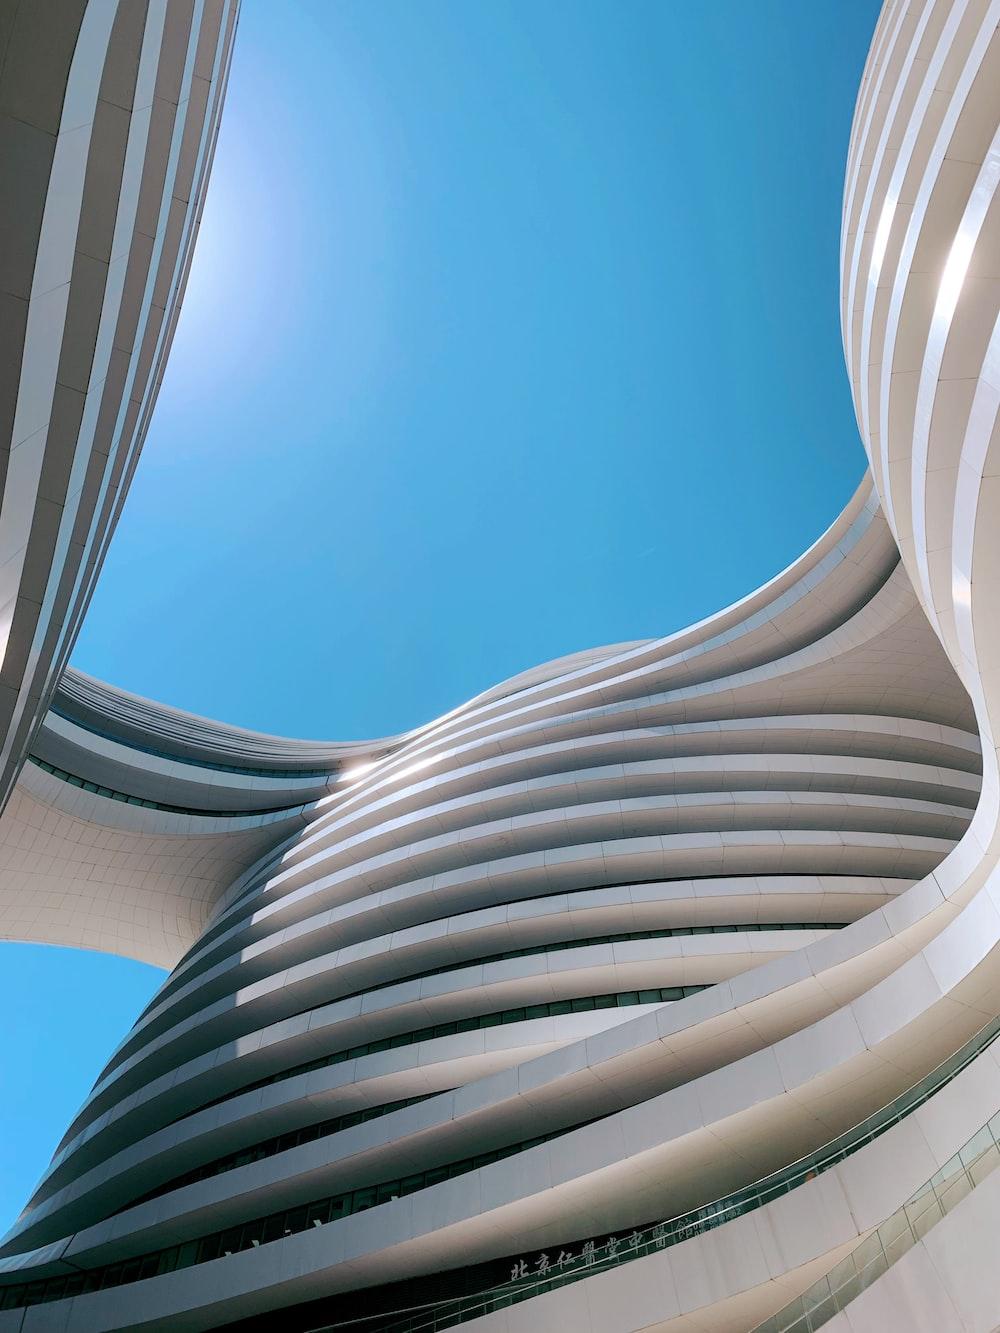 white concrete building under blue skies